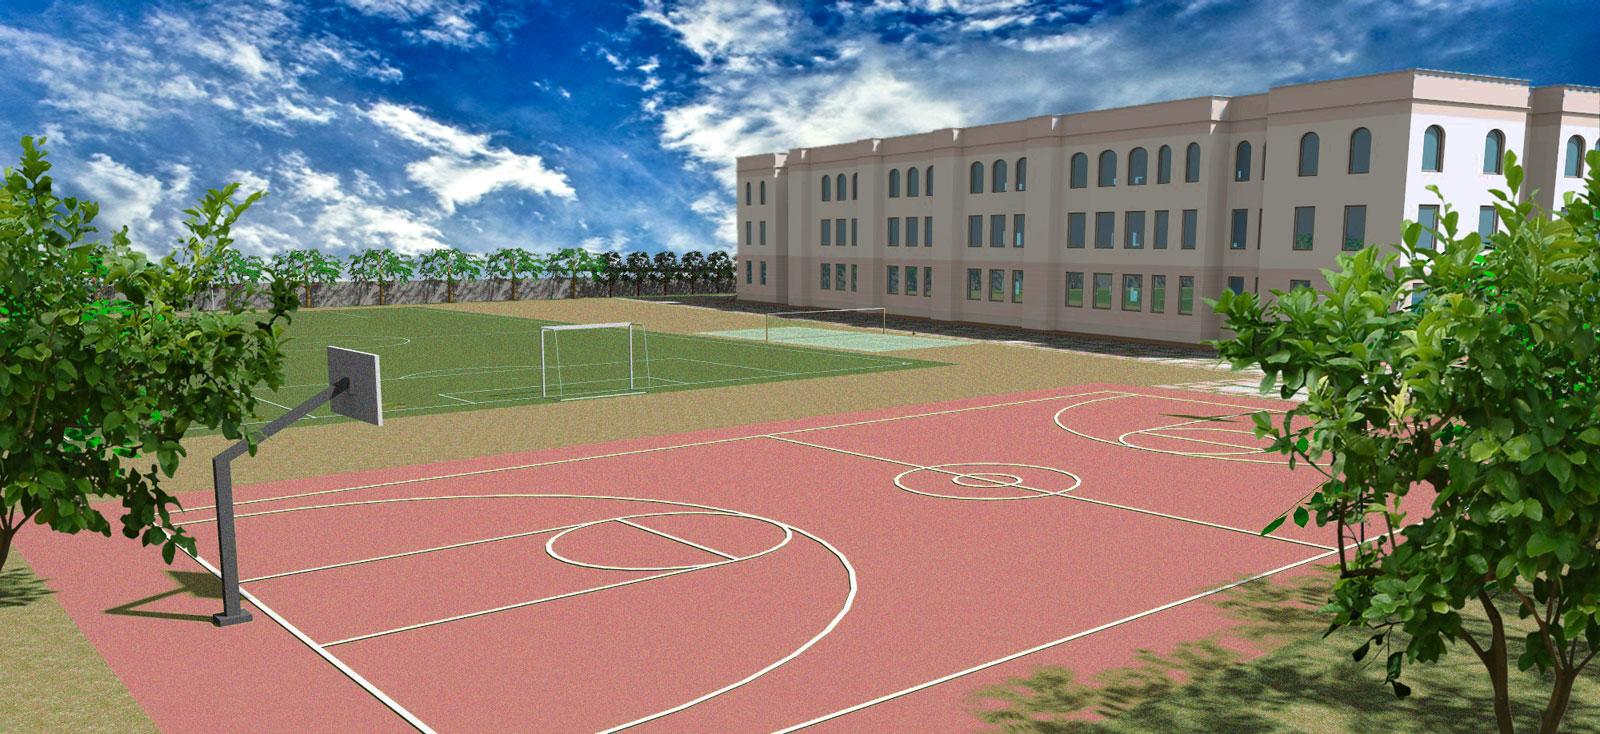 BEST ARCHITECT FOR SCHOOLS IN HARYANA